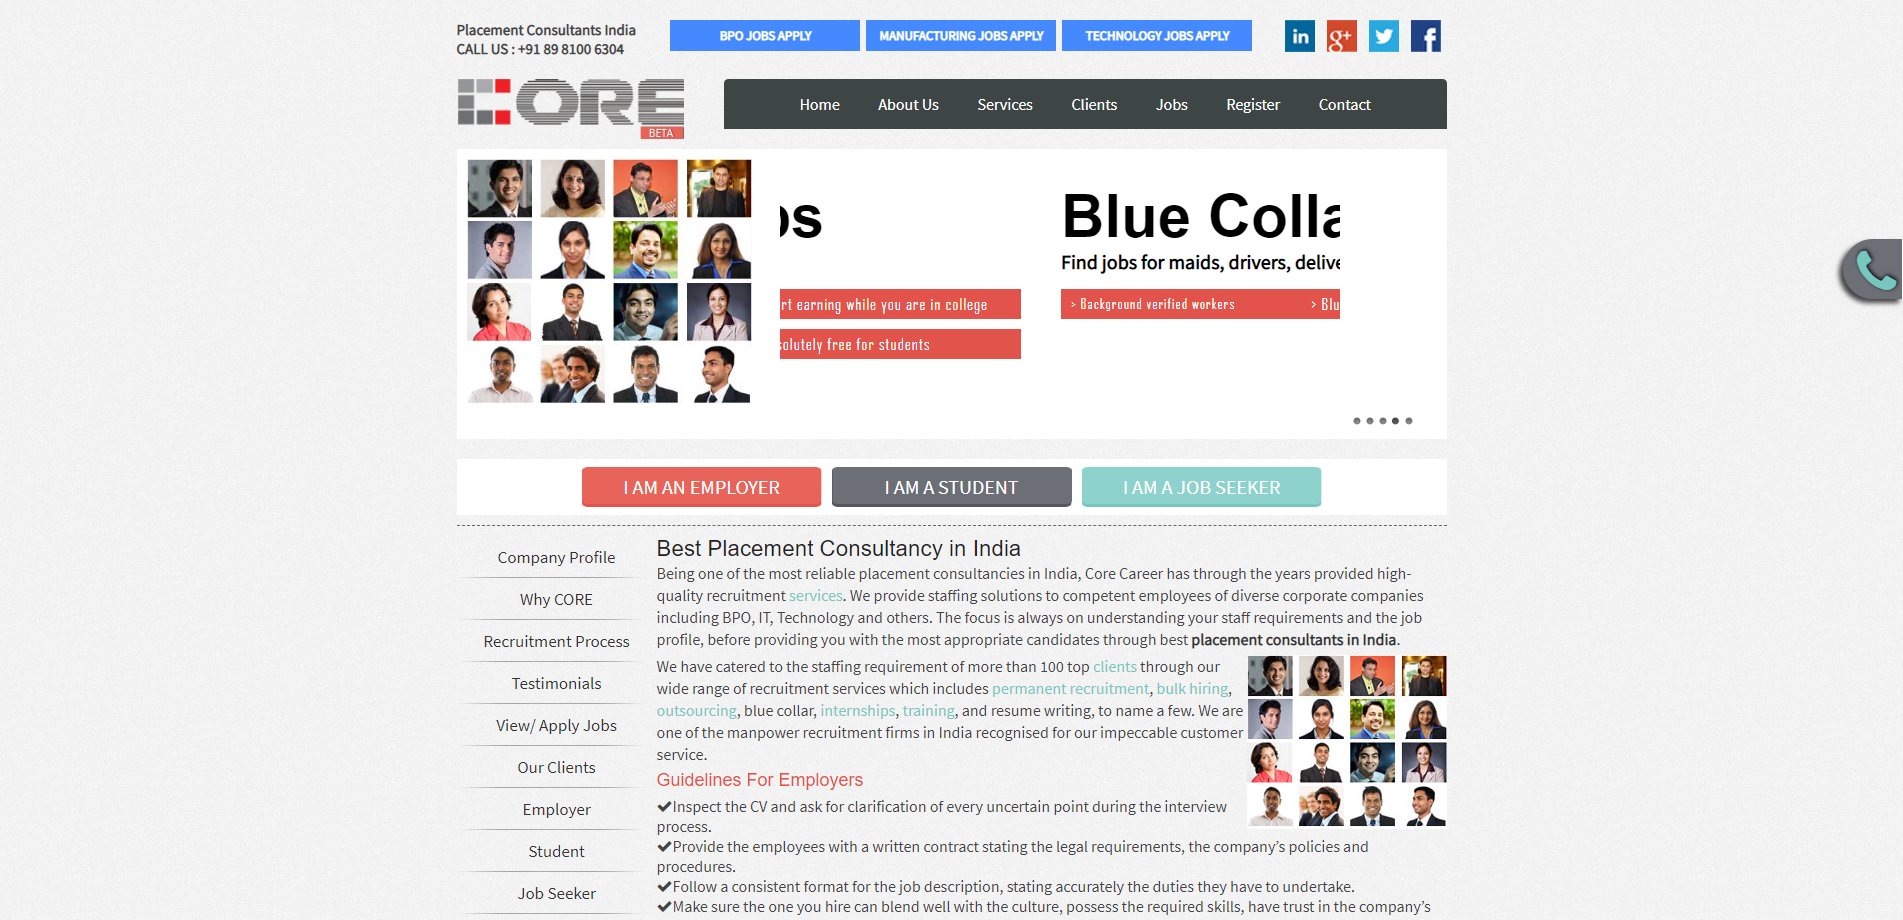 Careersatcore.com